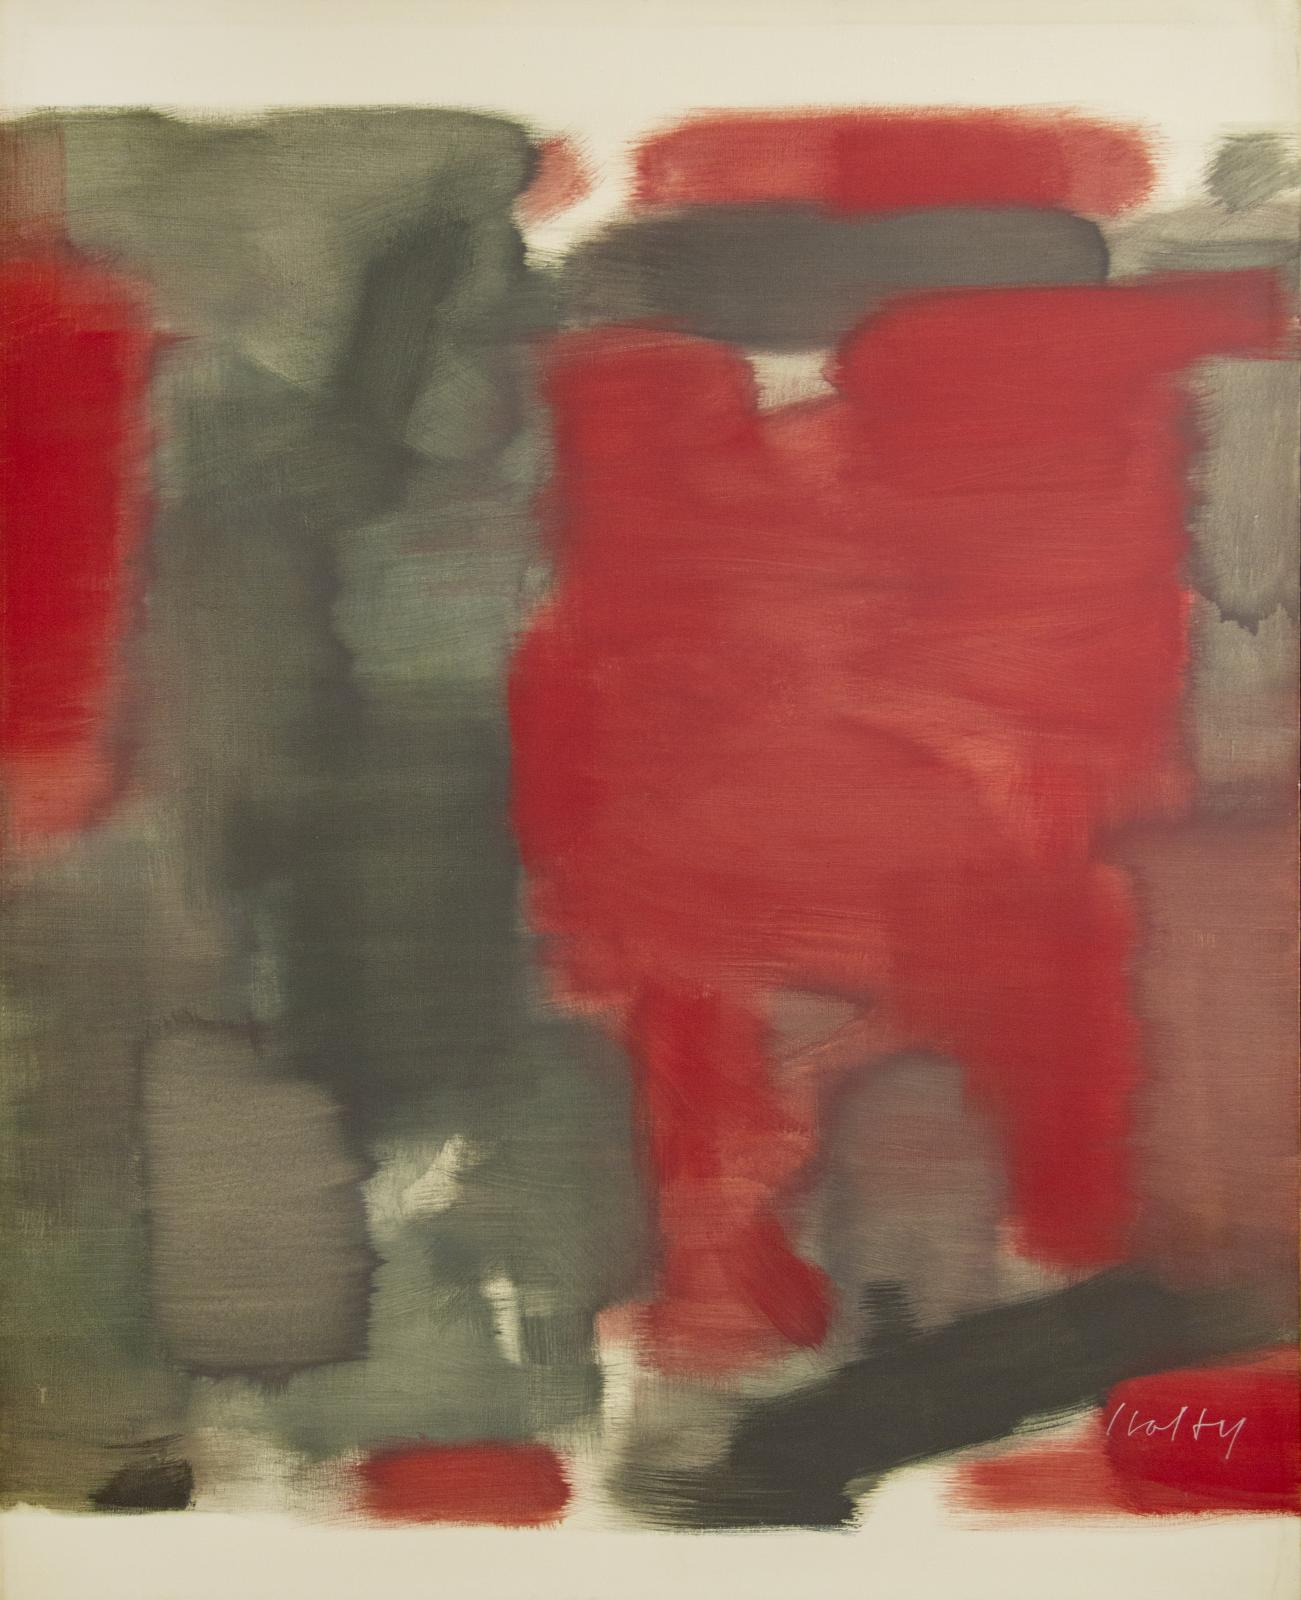 Twelfth Night (Red, Gray)